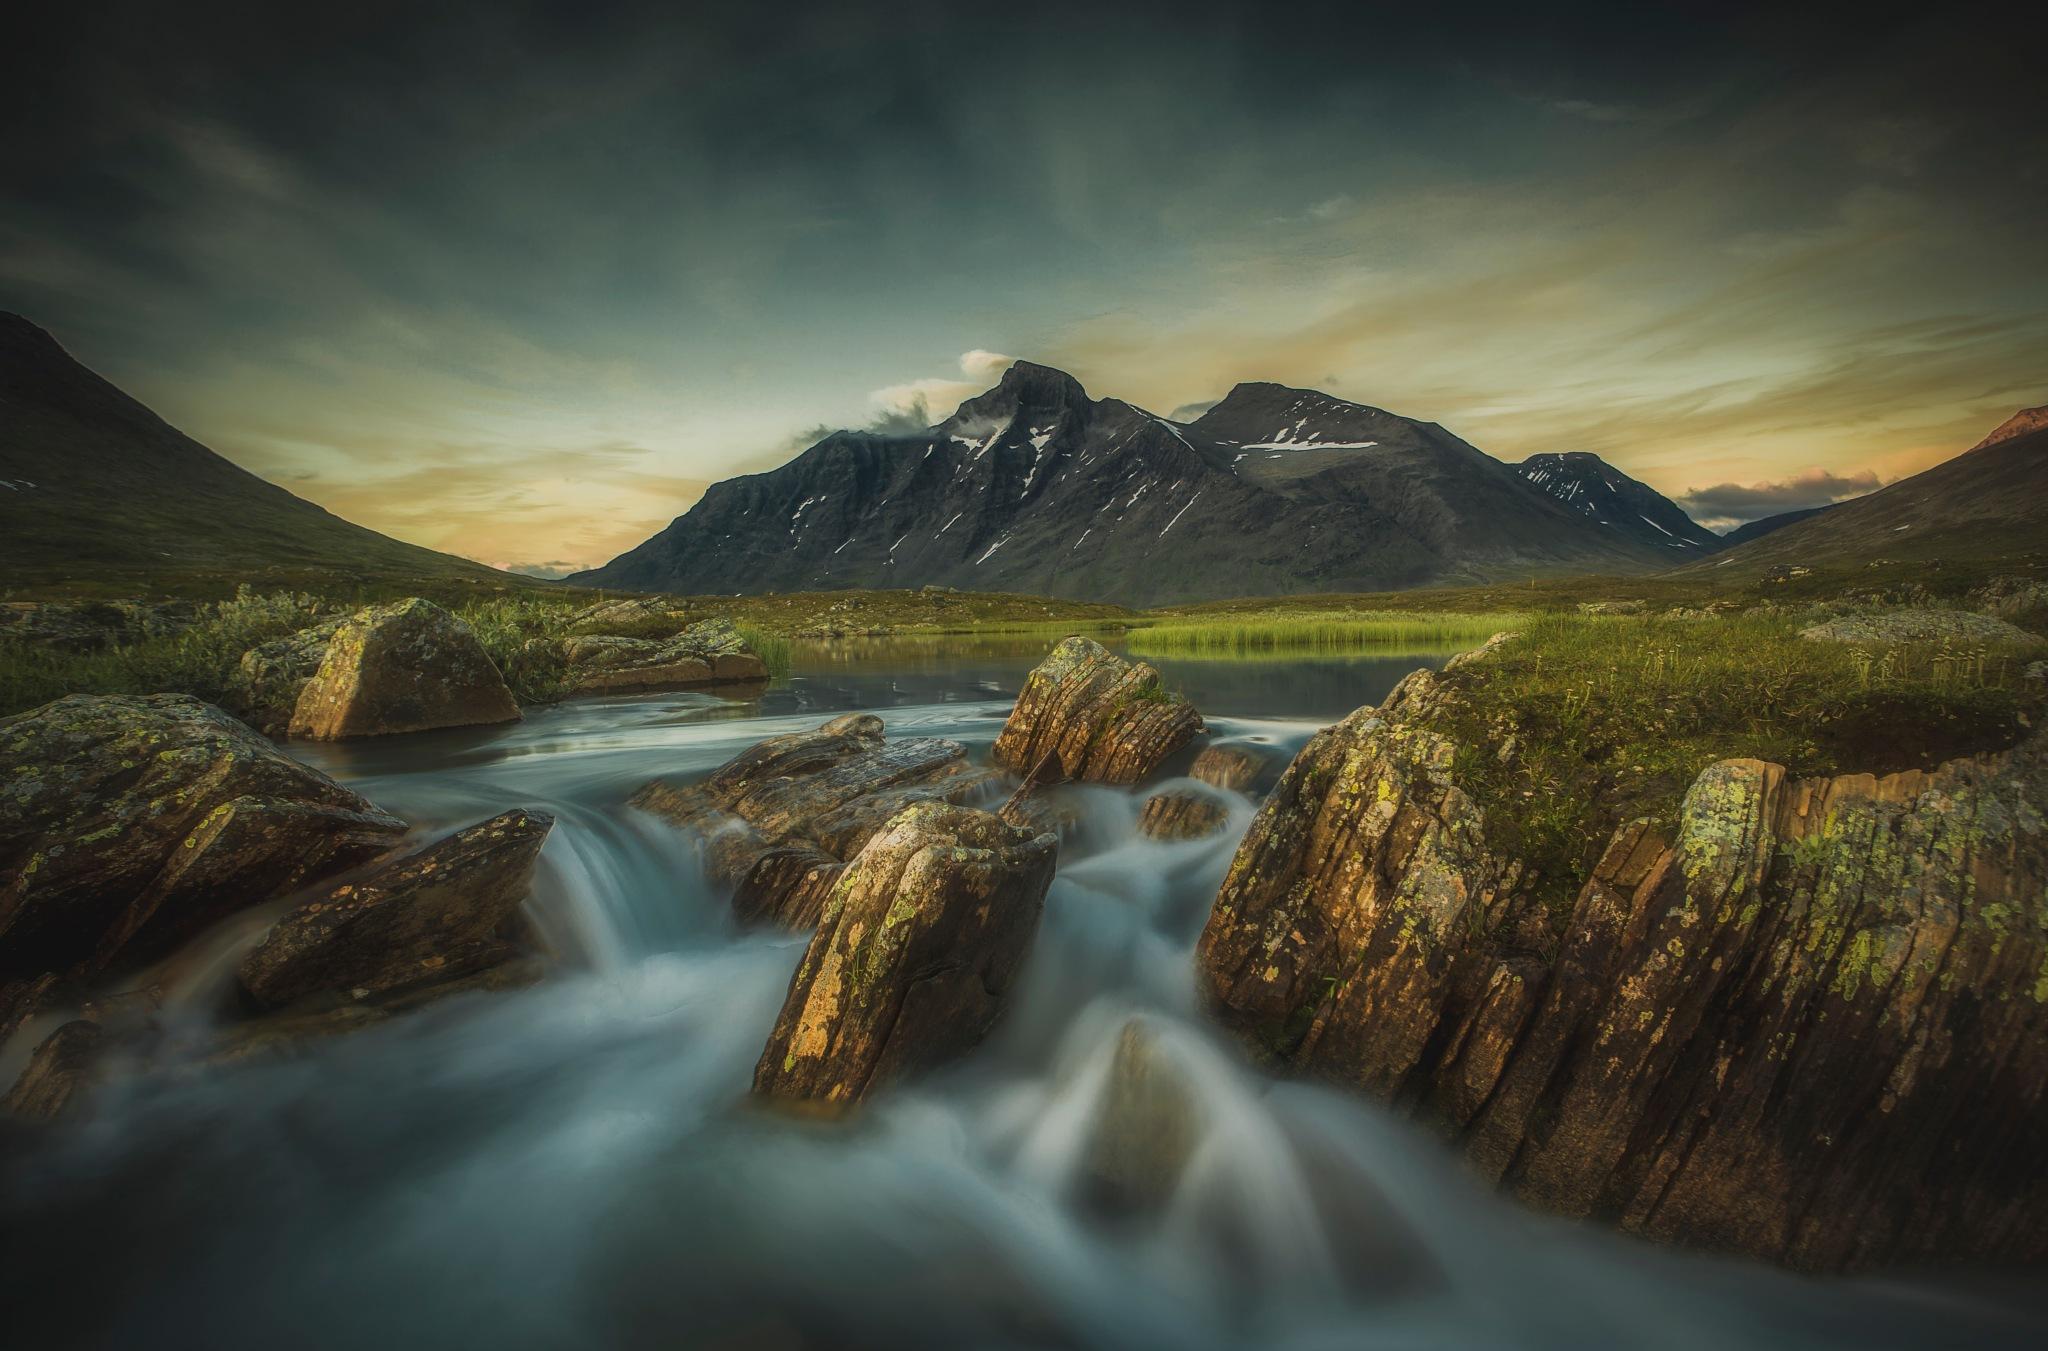 Sunset over Swedish mountain  by Mattias Borg